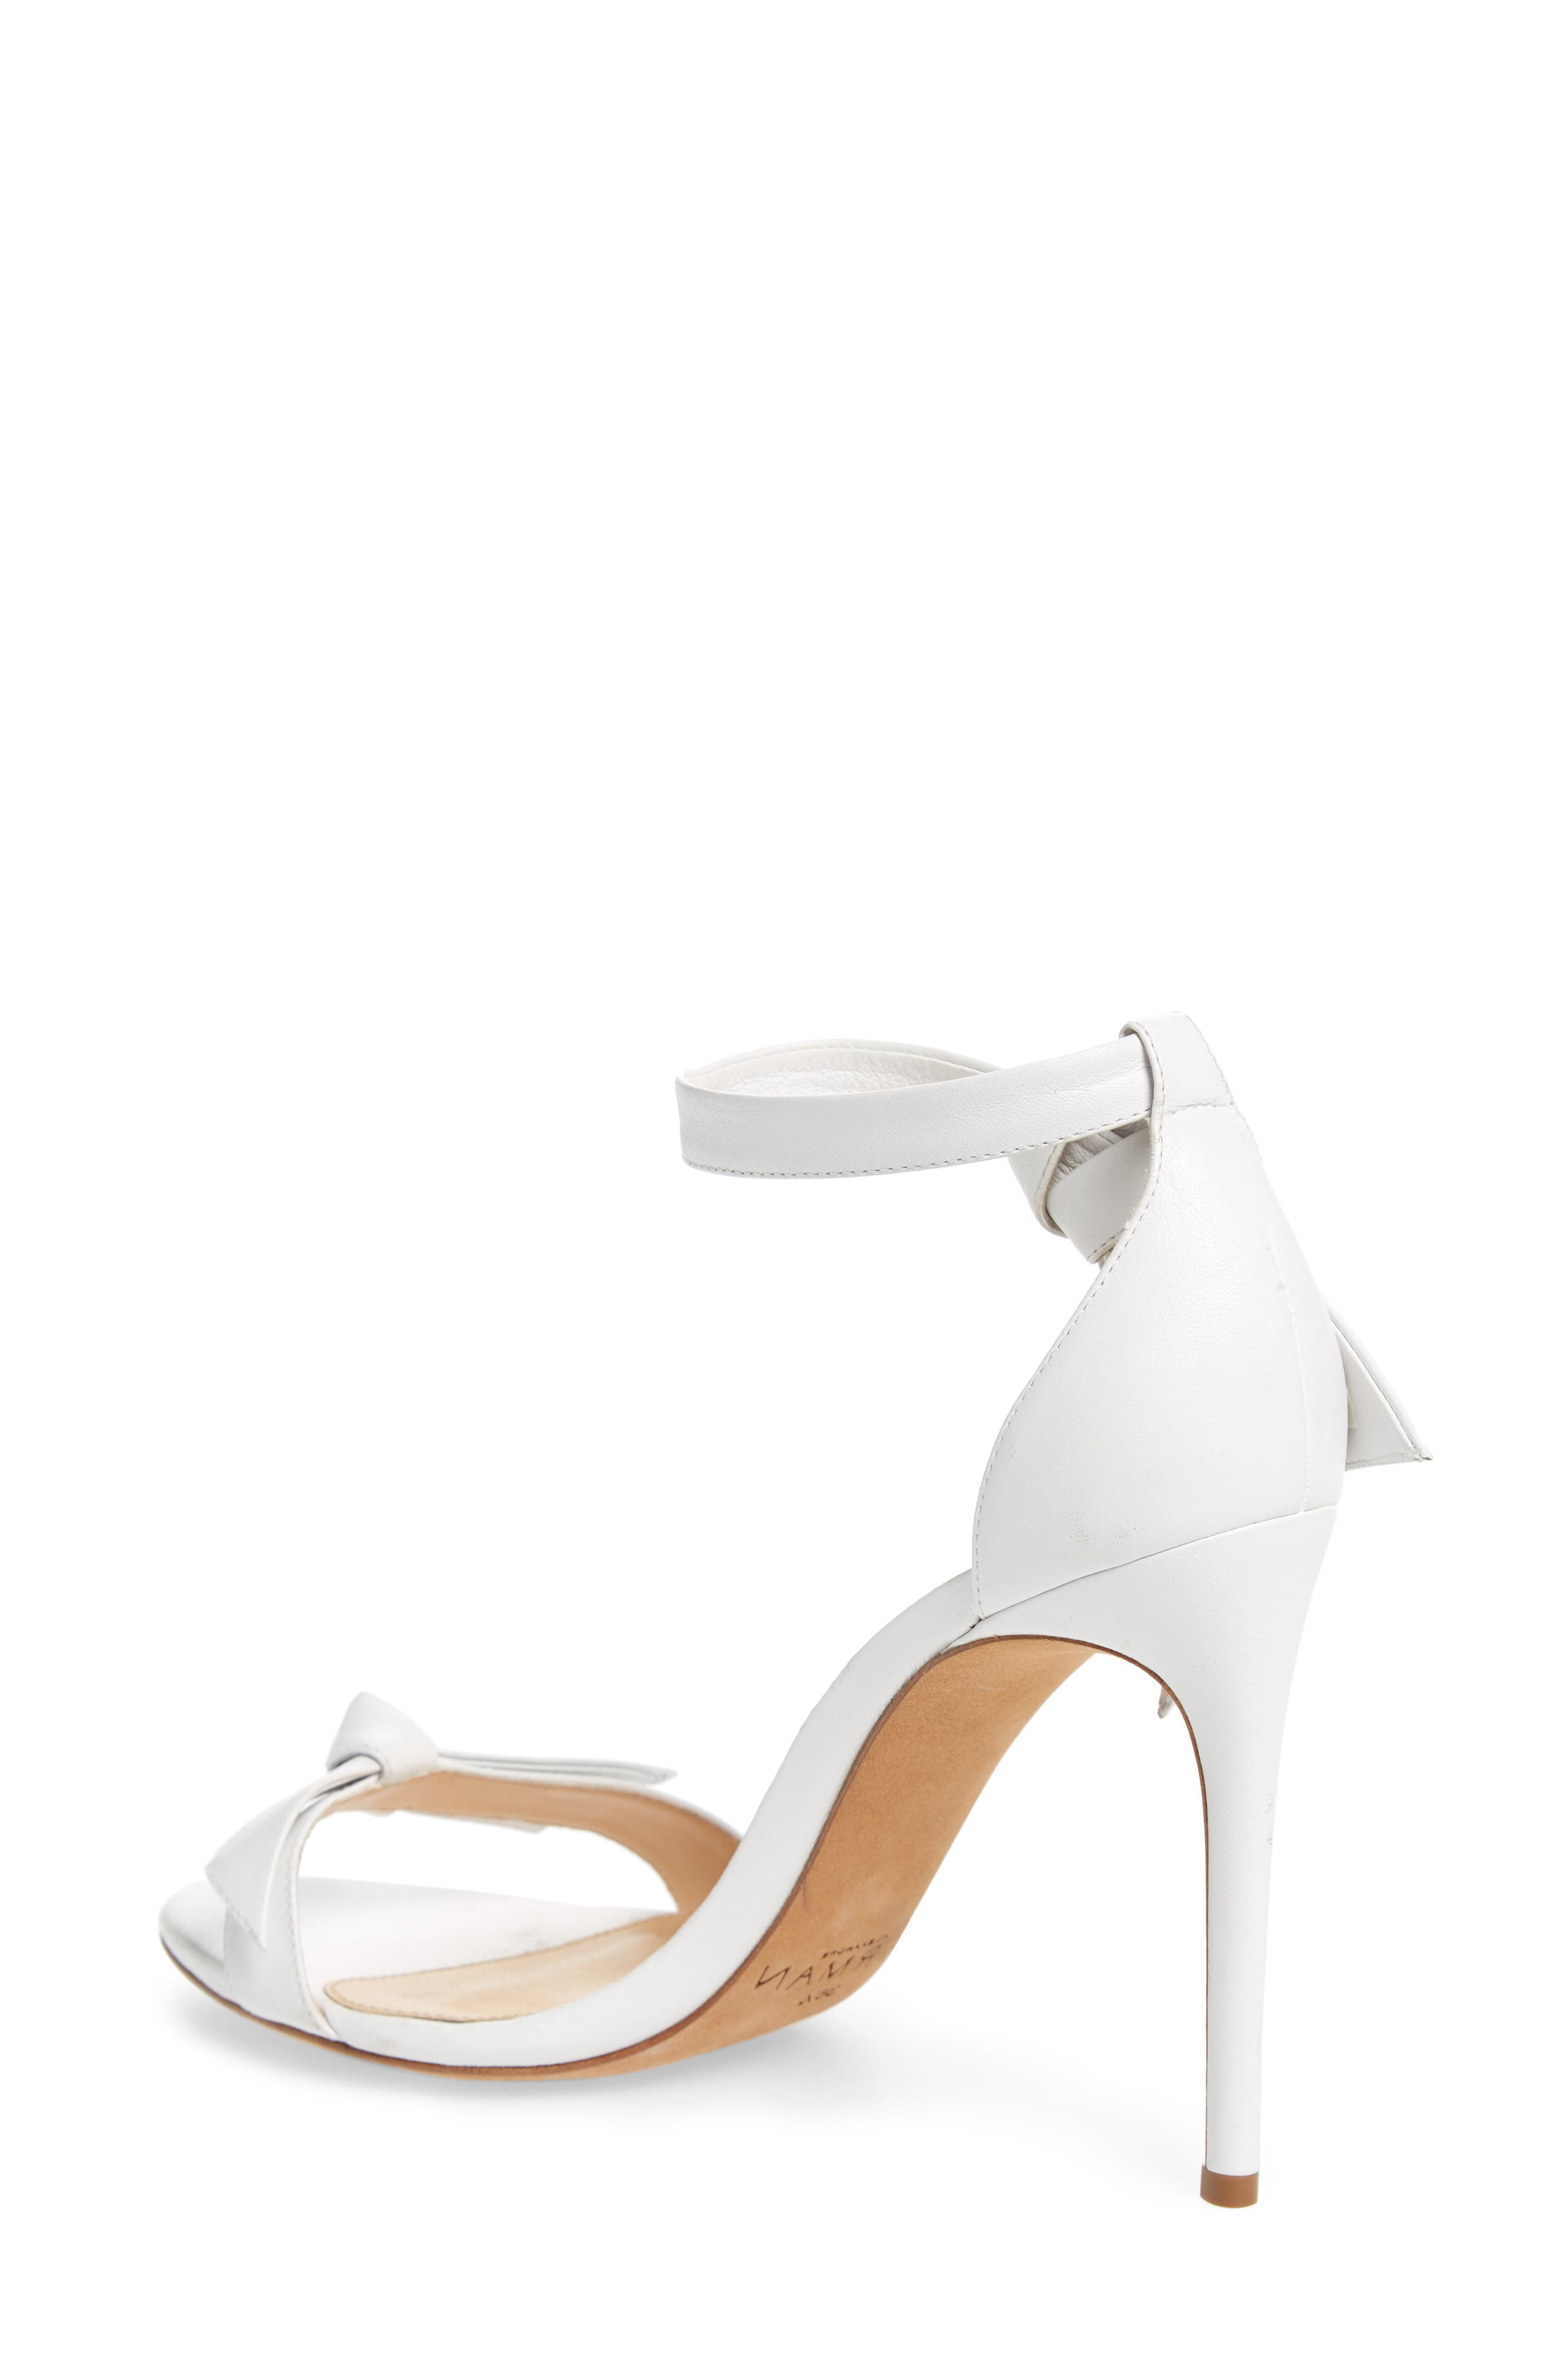 'Clarita' Ankle Tie Sandal,                             Alternate thumbnail 2, color,                             WHITE LEATHER